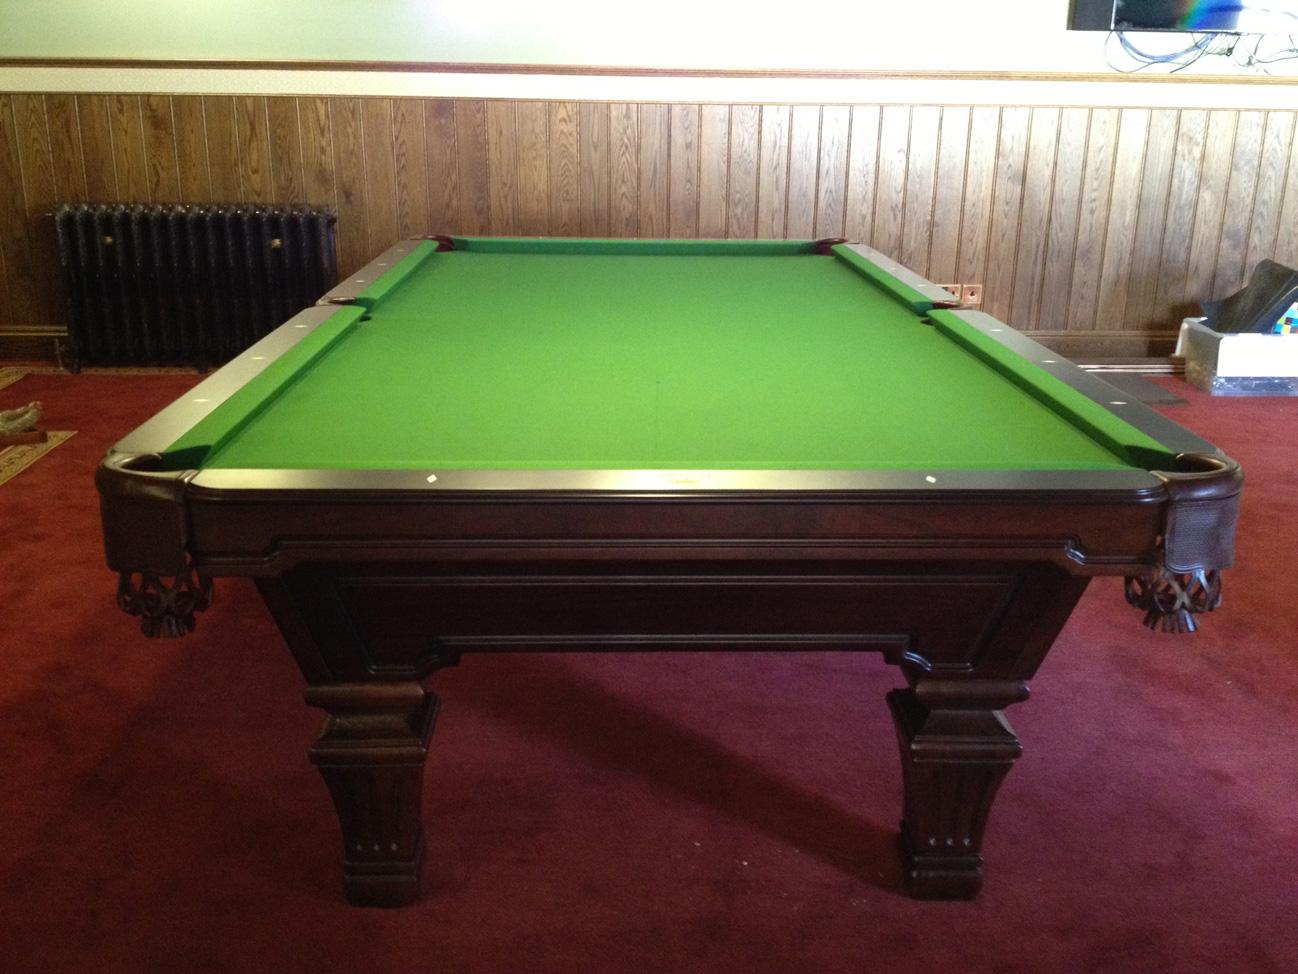 Olhausen Hampton Pool Table American Pool Table - Olhausen hampton pool table